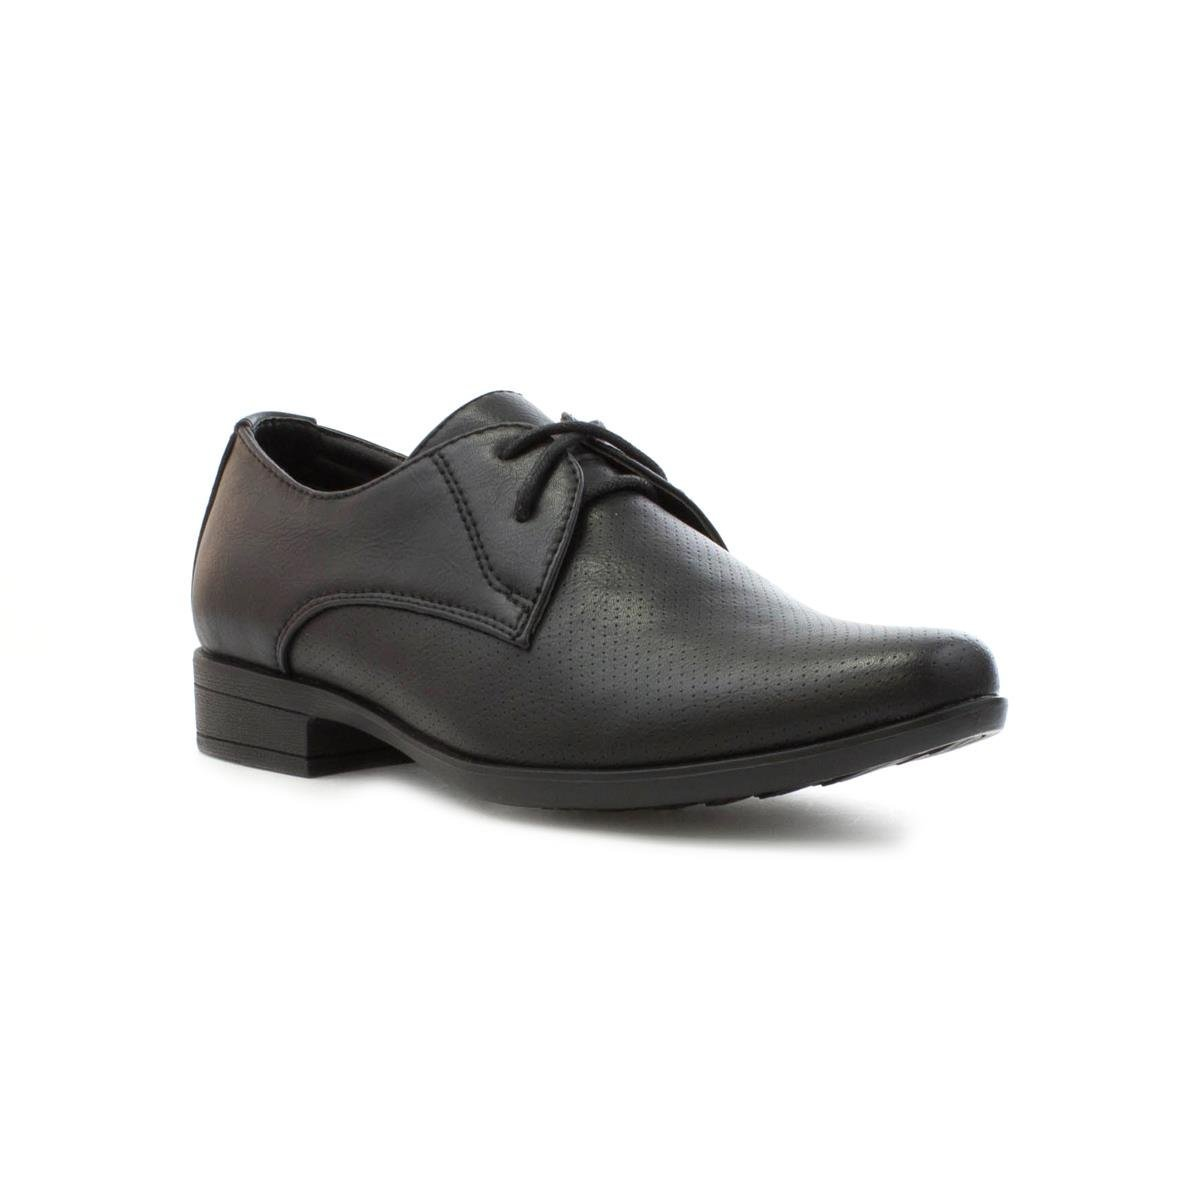 BECKETT CORP. Beckett Boys Formal Lace up Shoe in Black